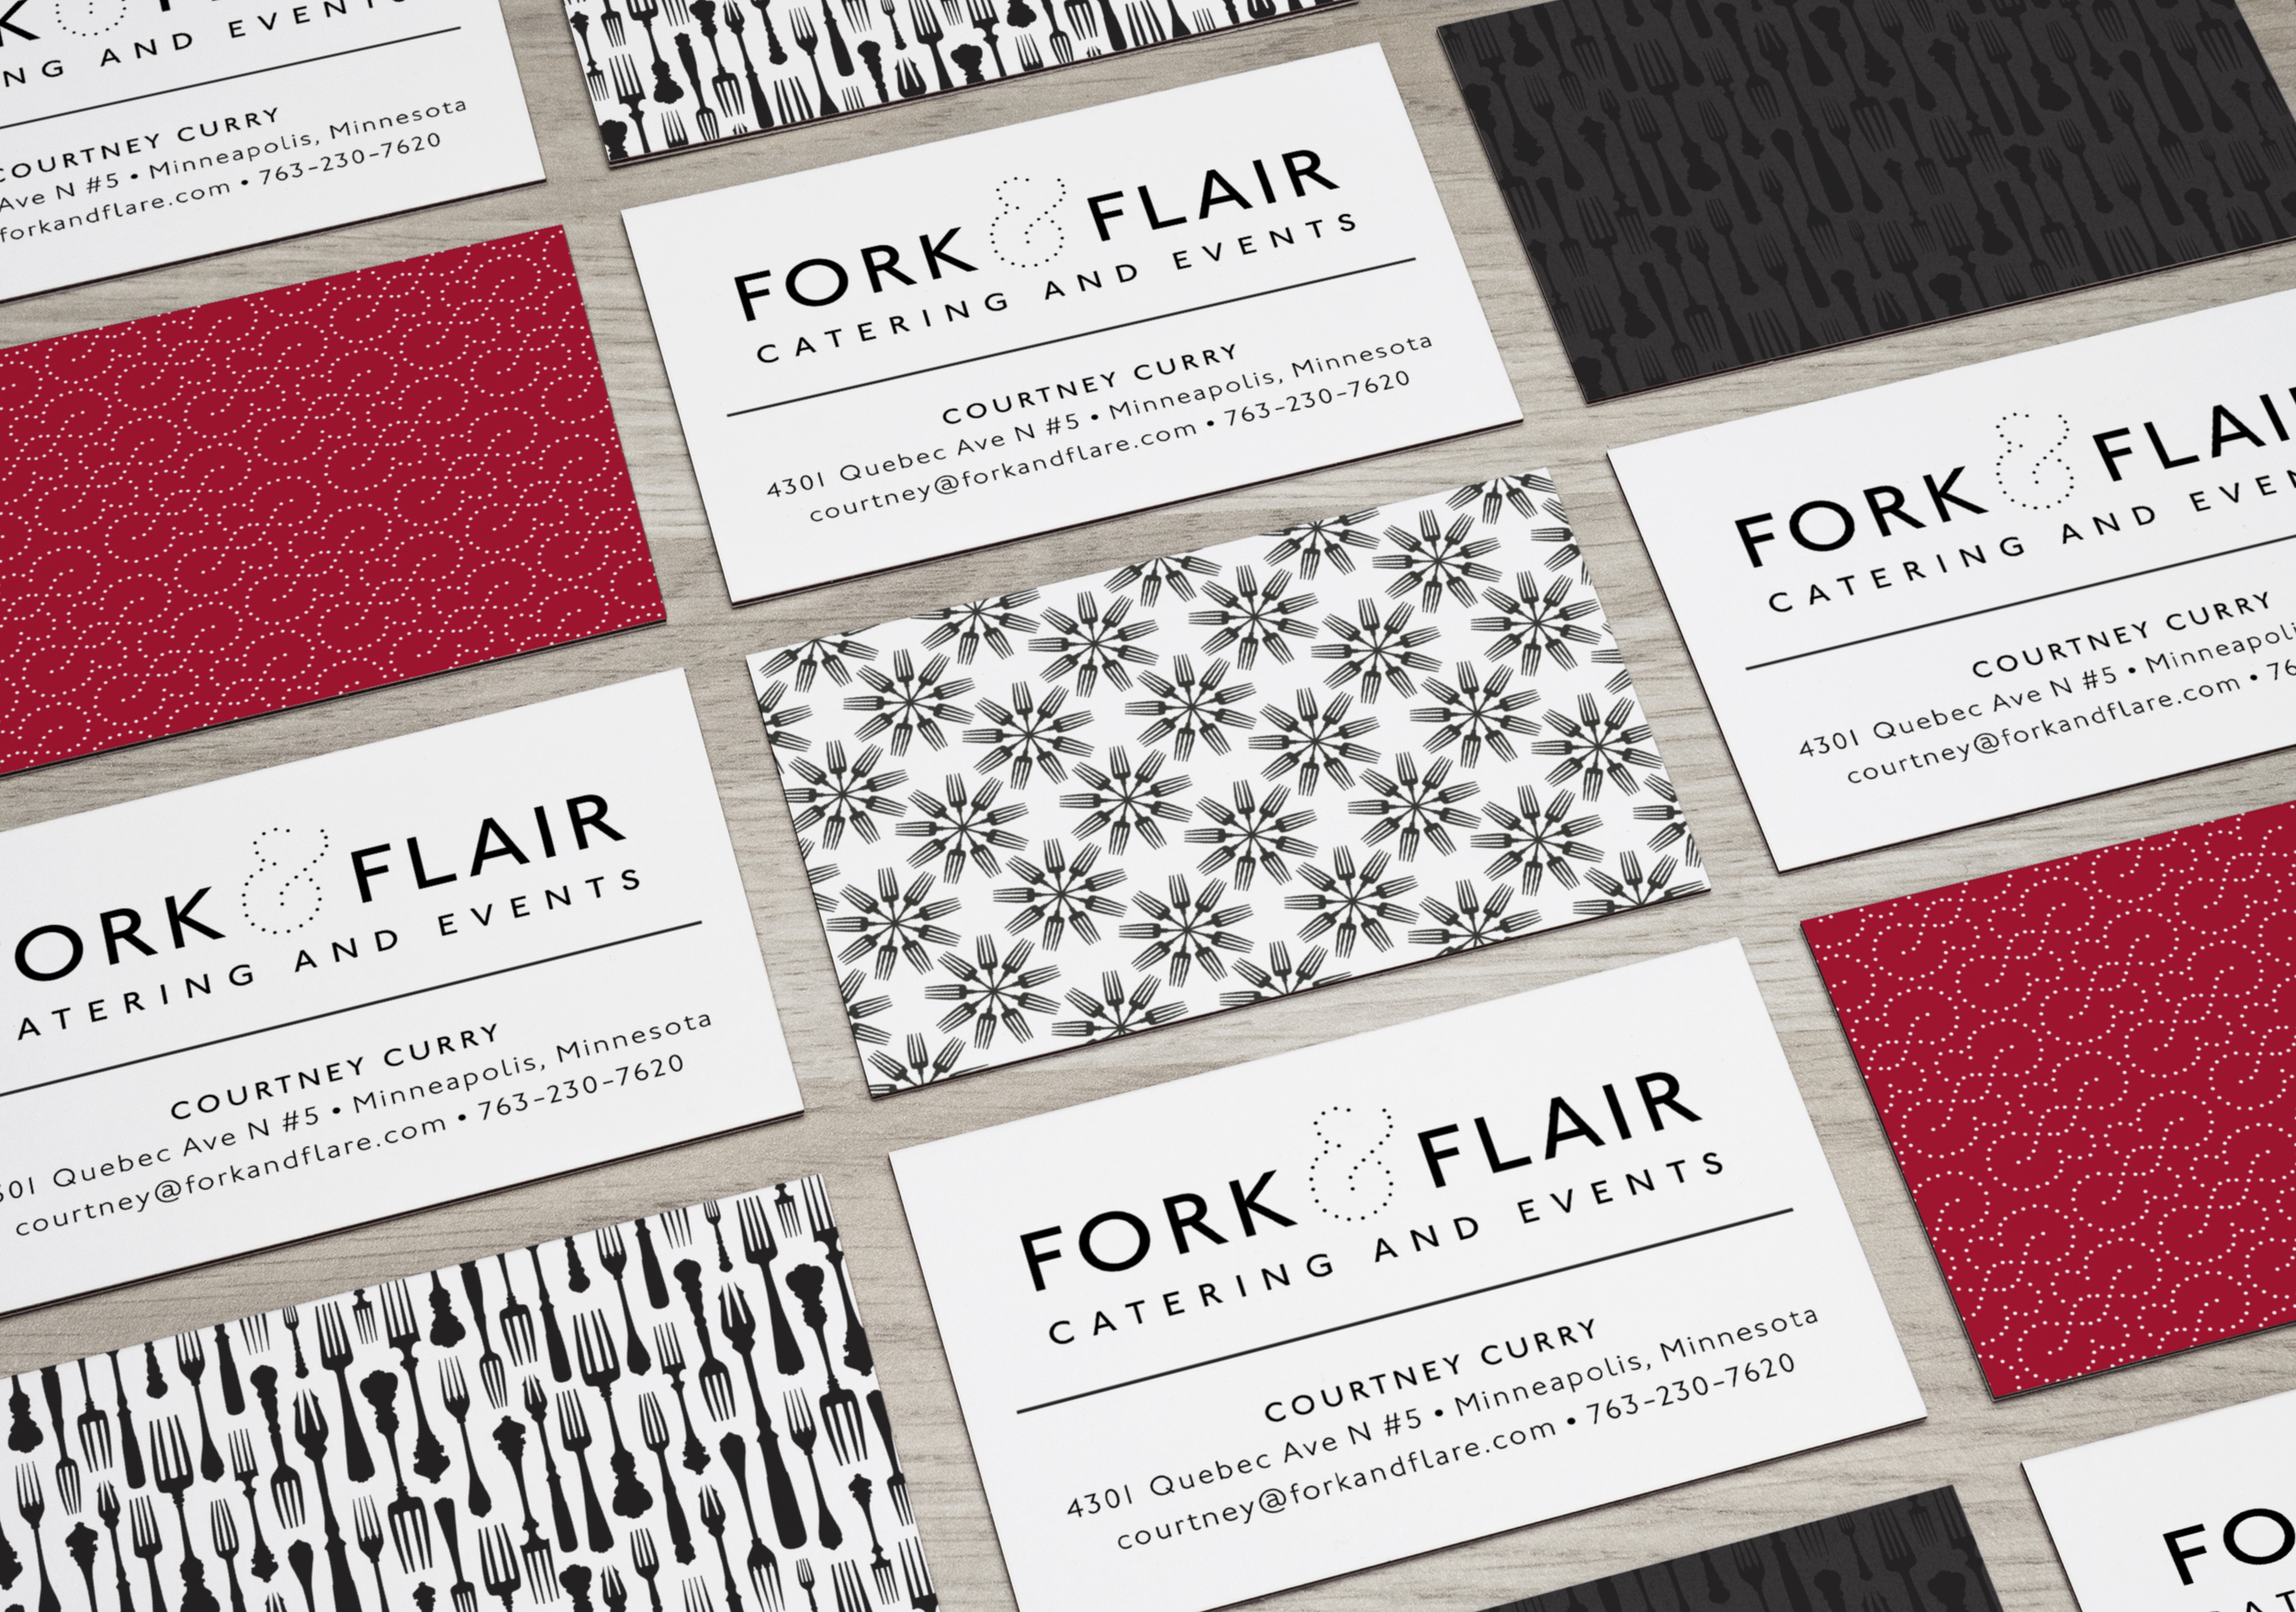 ff_businesscard_flat.jpg